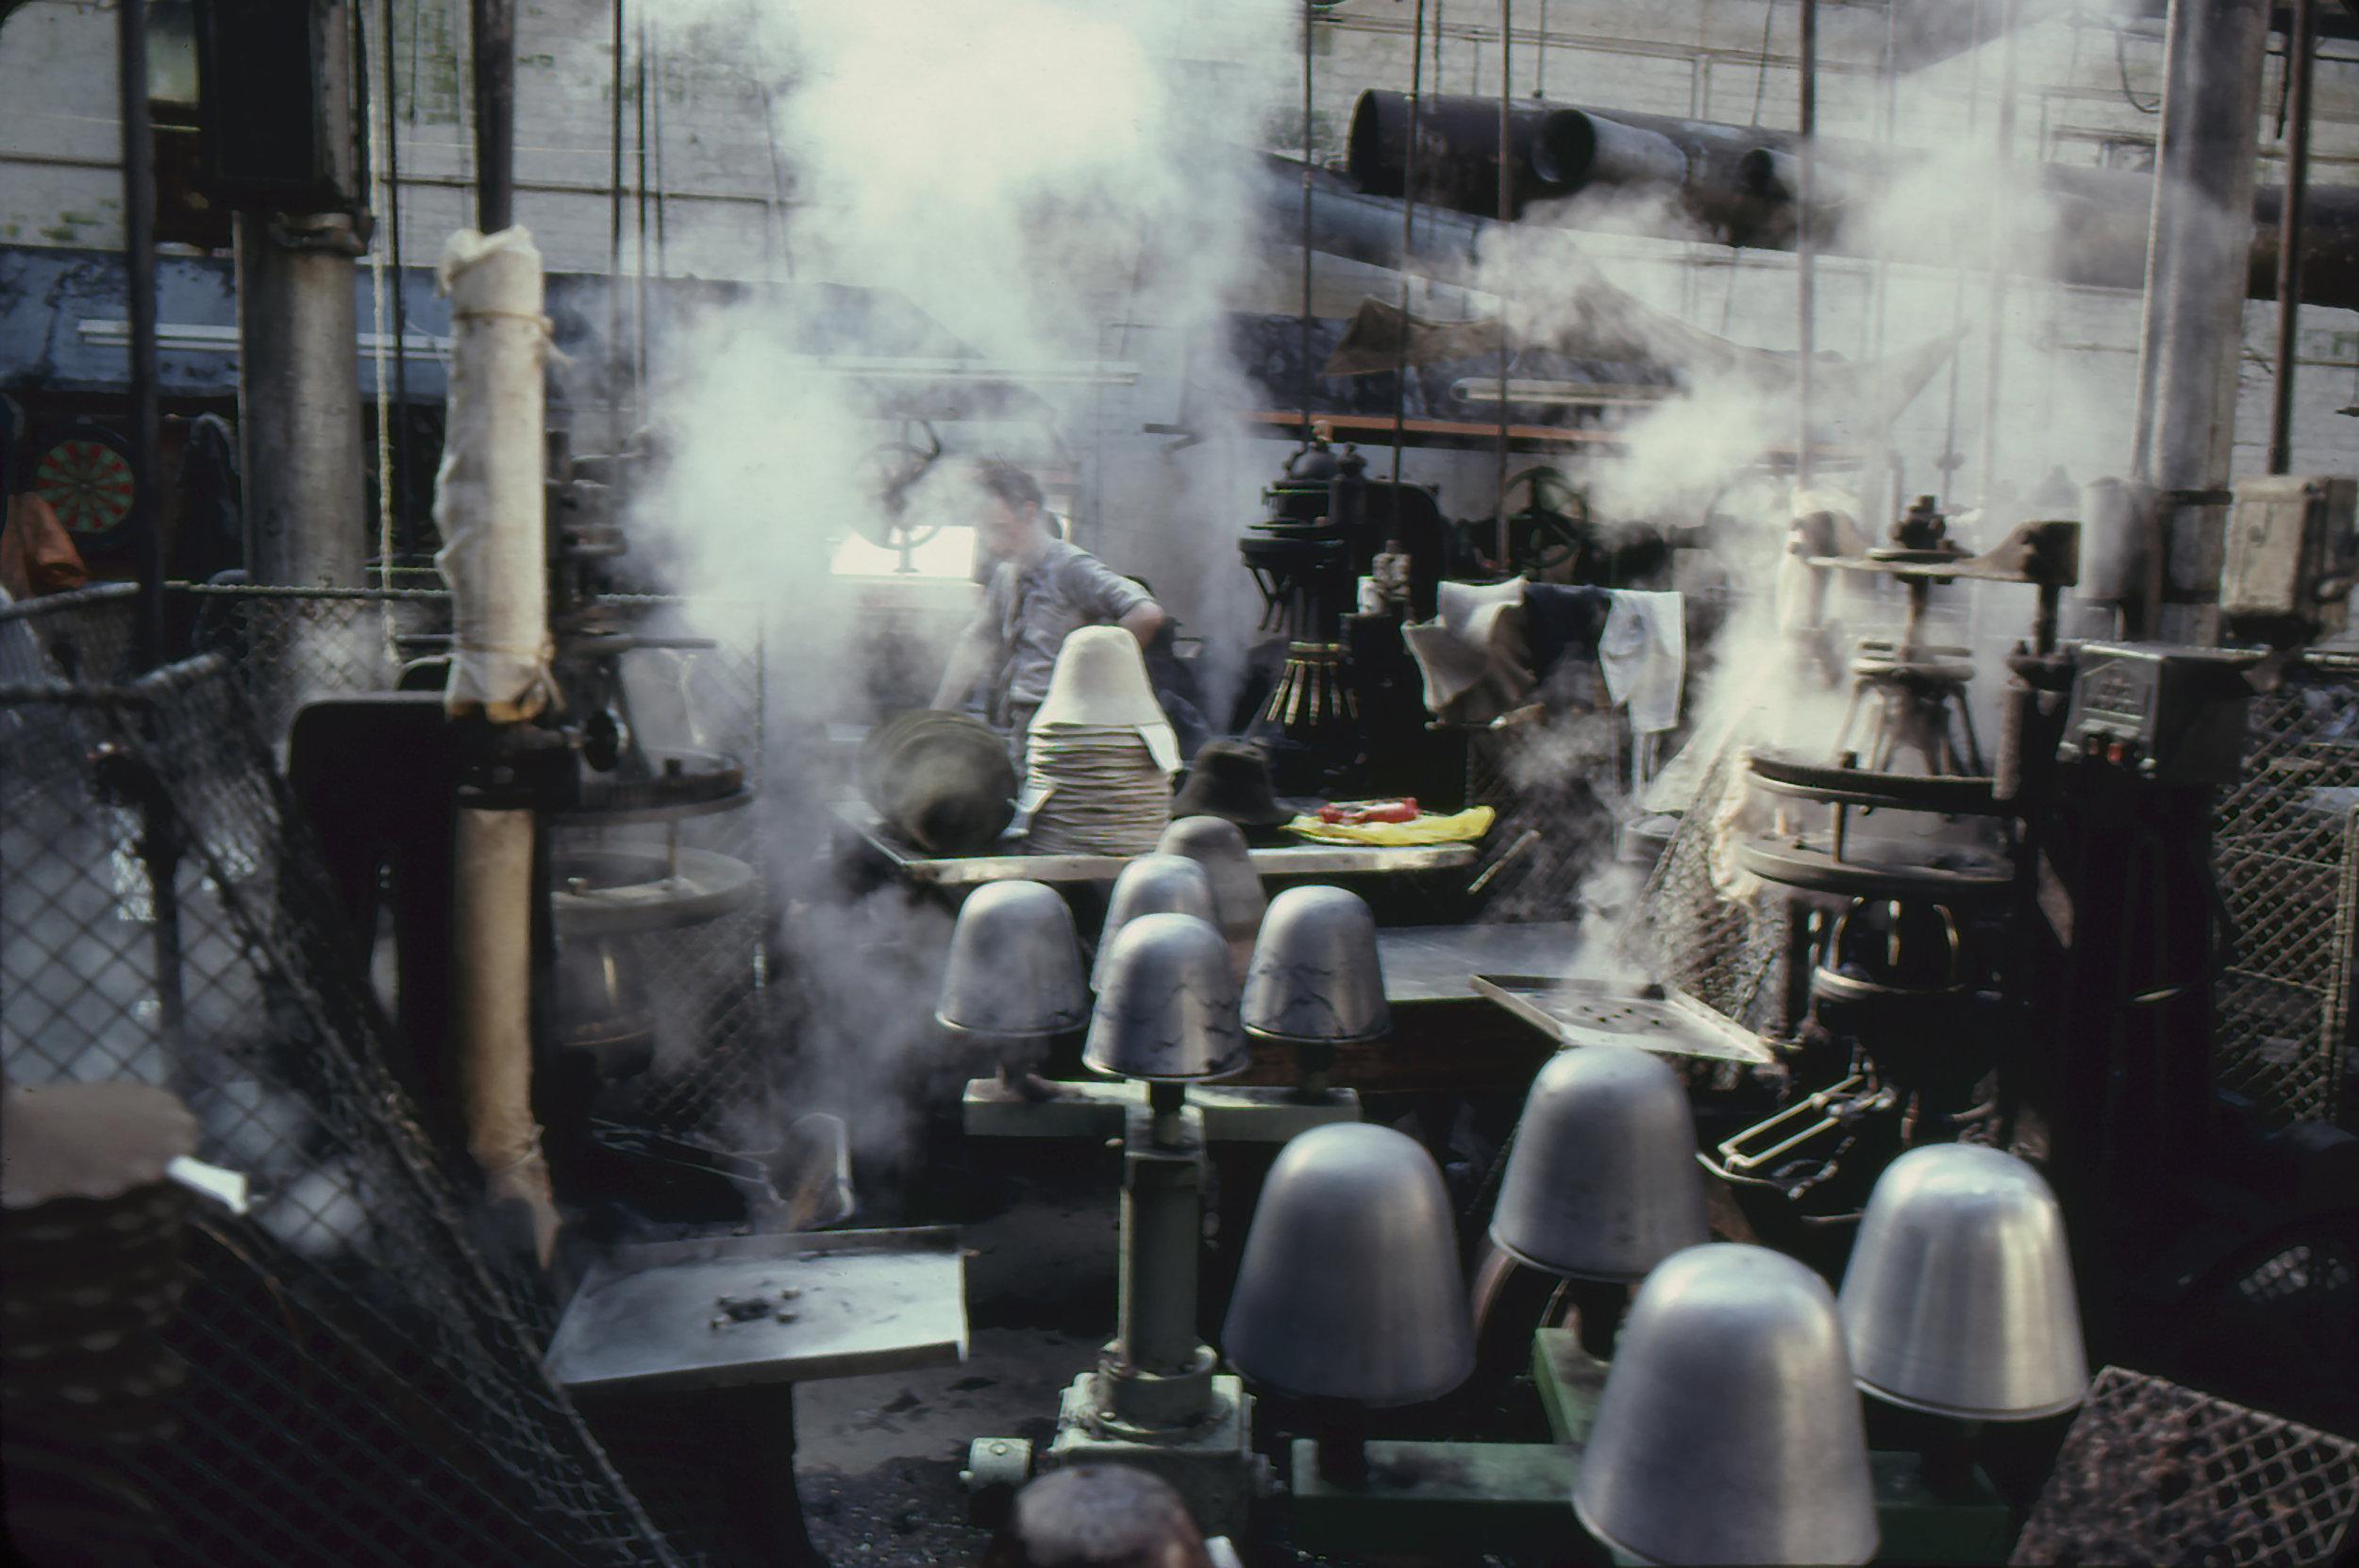 Hat Factory #2